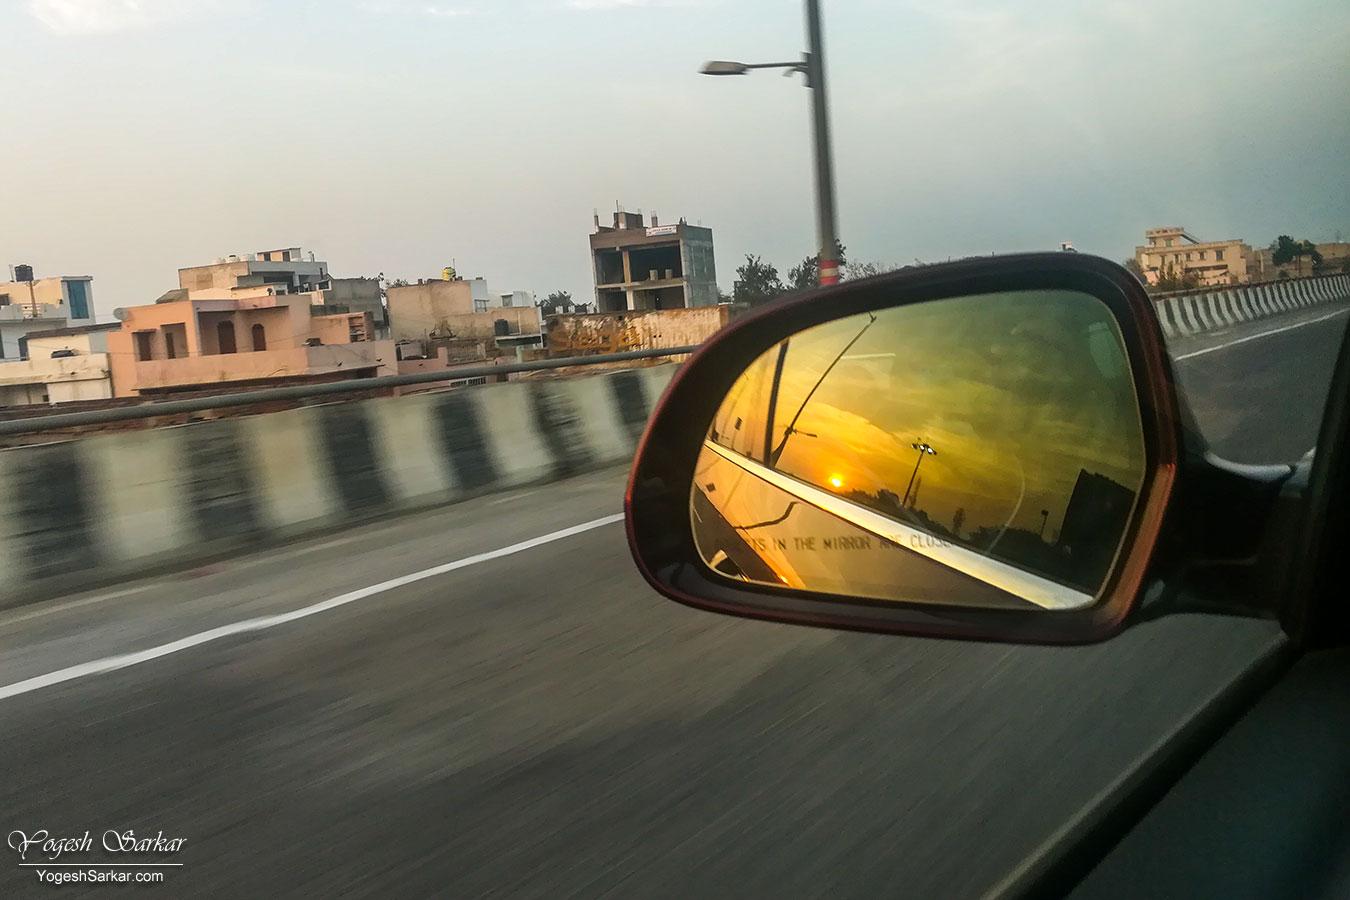 09-nh-8-sunset.jpg